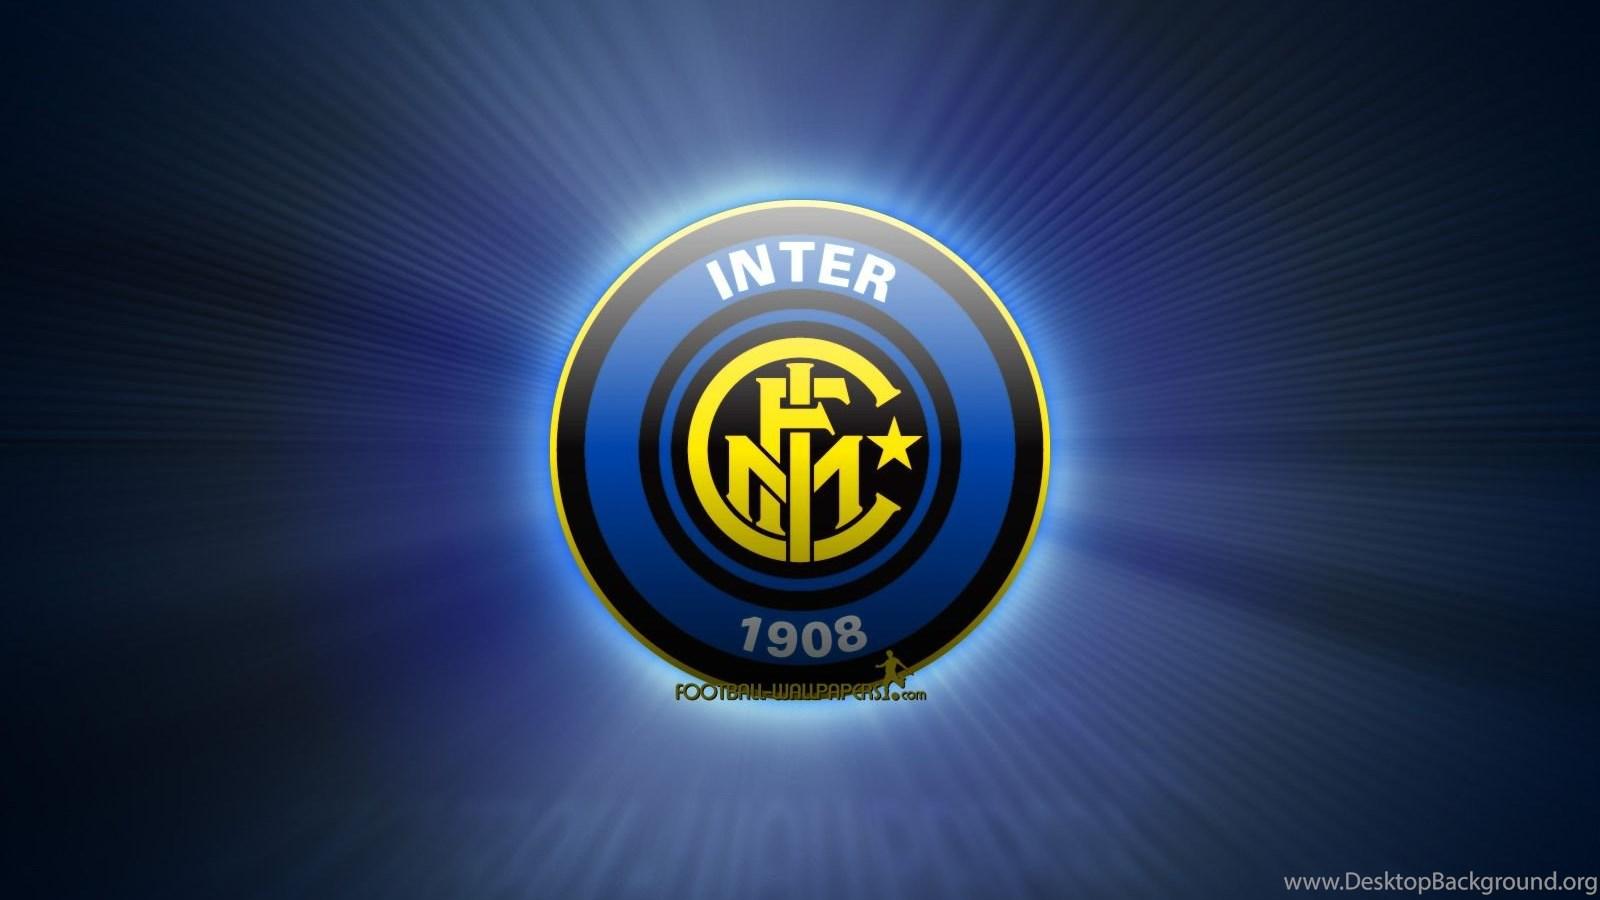 Download Inter Milan Wallpapers Hd Photos Desktop Background